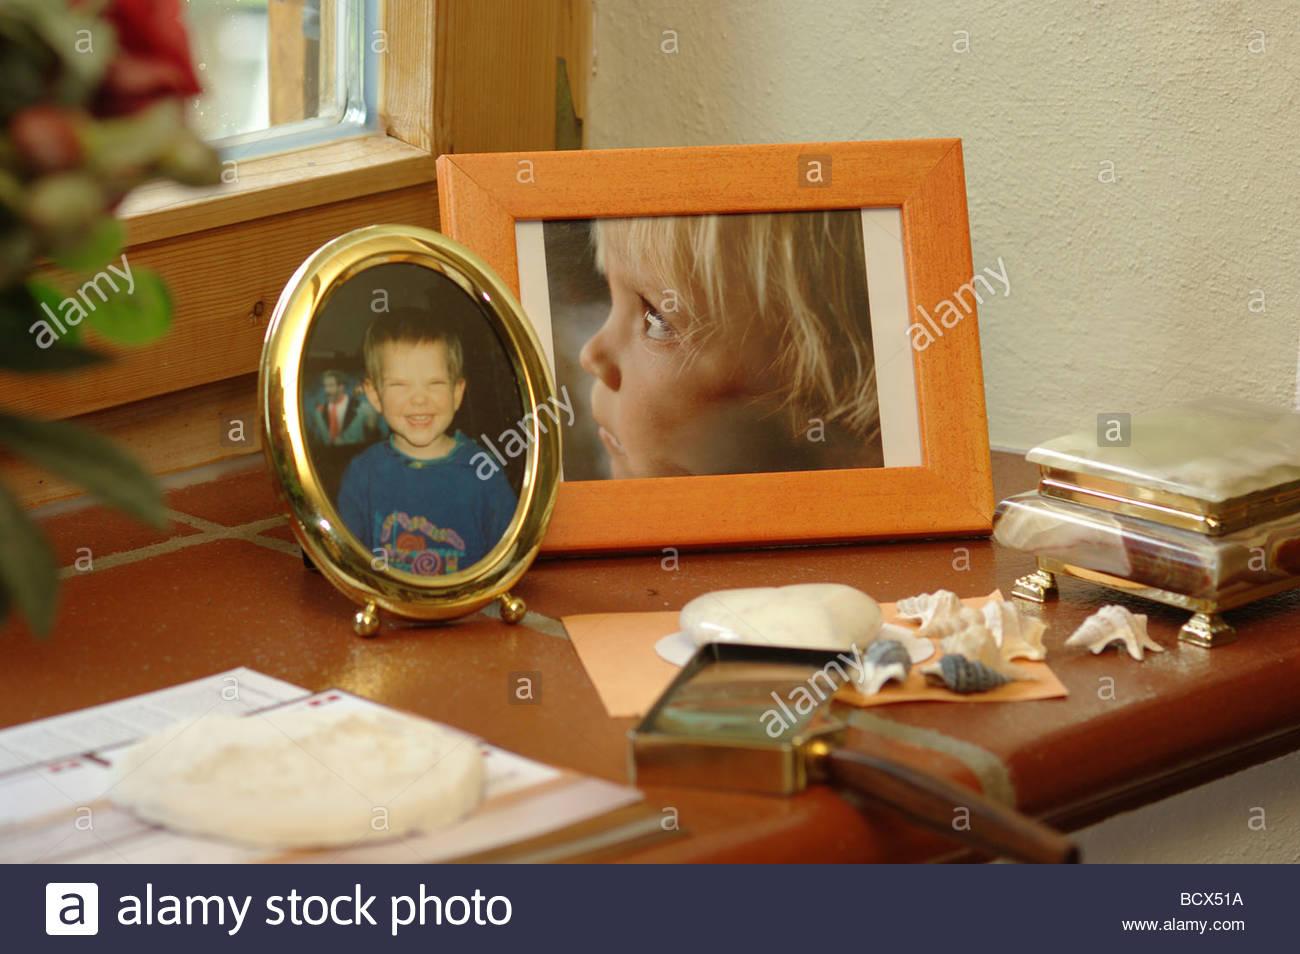 GRANDMAS MANTELPIECE MANTELPIECES GRANDMOTHERS GRANDPARENTS MEMORIES PHOTOS MEMORY PICTURES MOMENTOUS - Stock Image